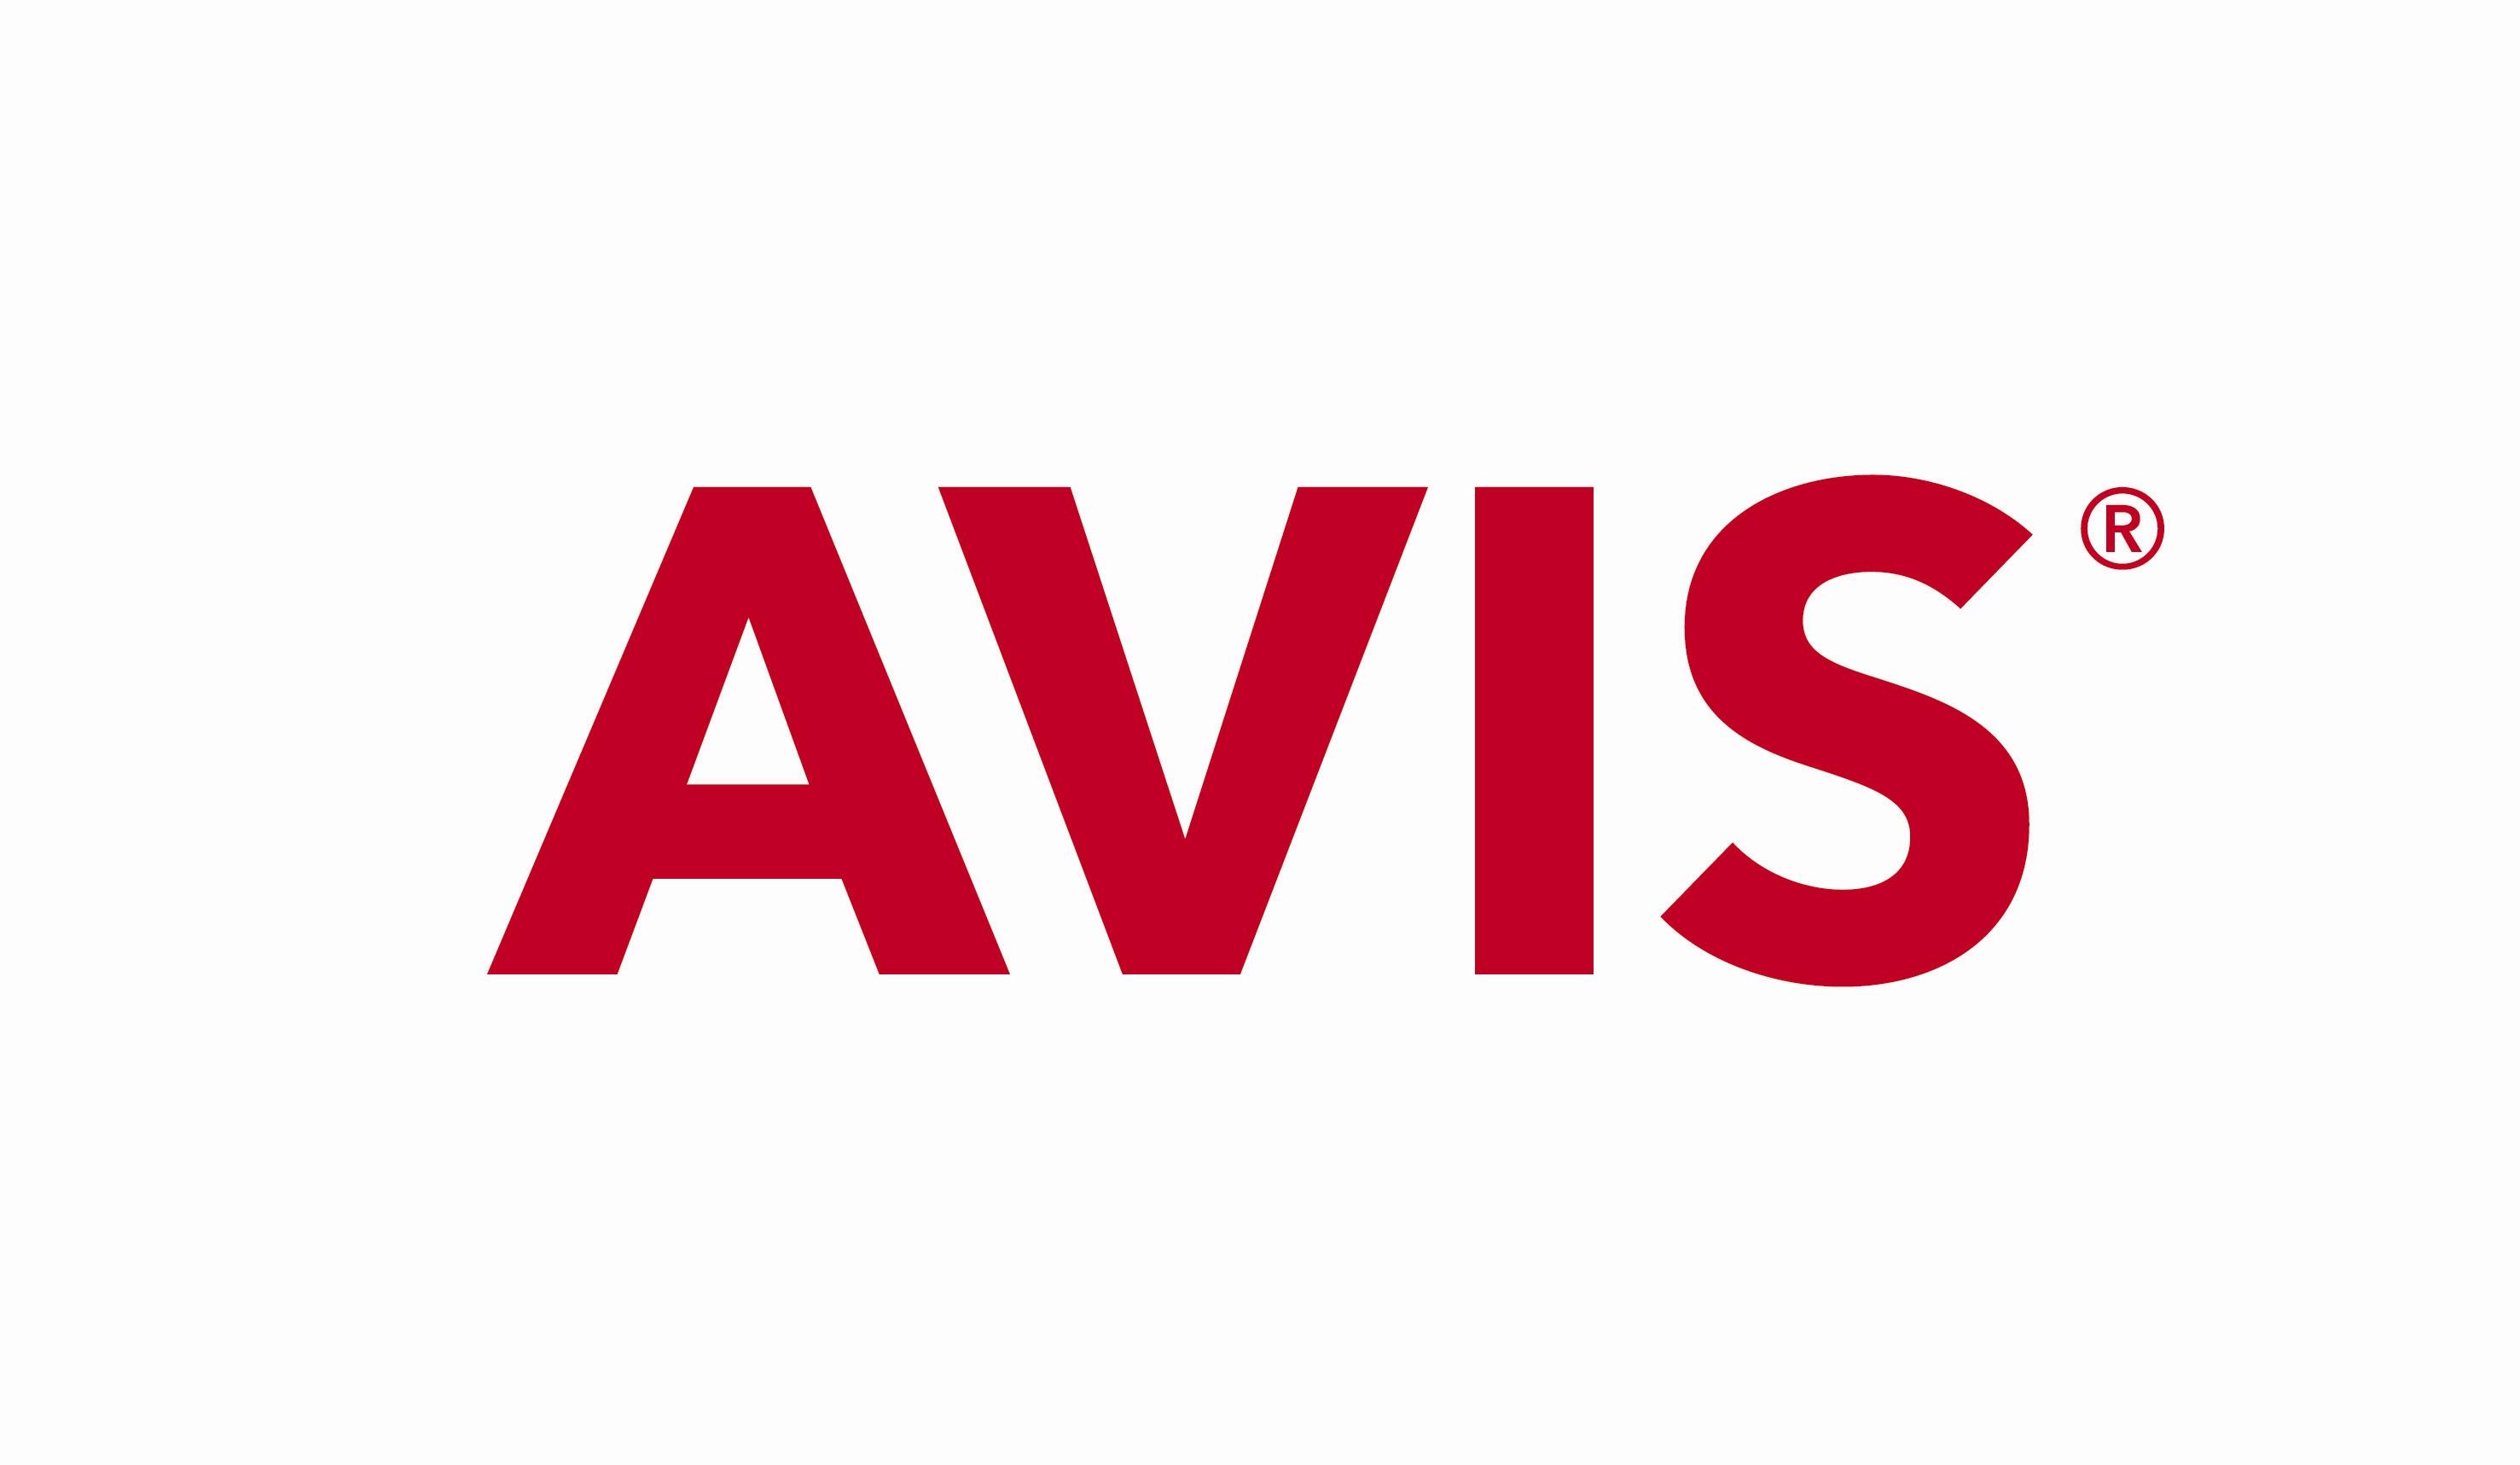 Bis zu 20 % Rabatt bei AVIS